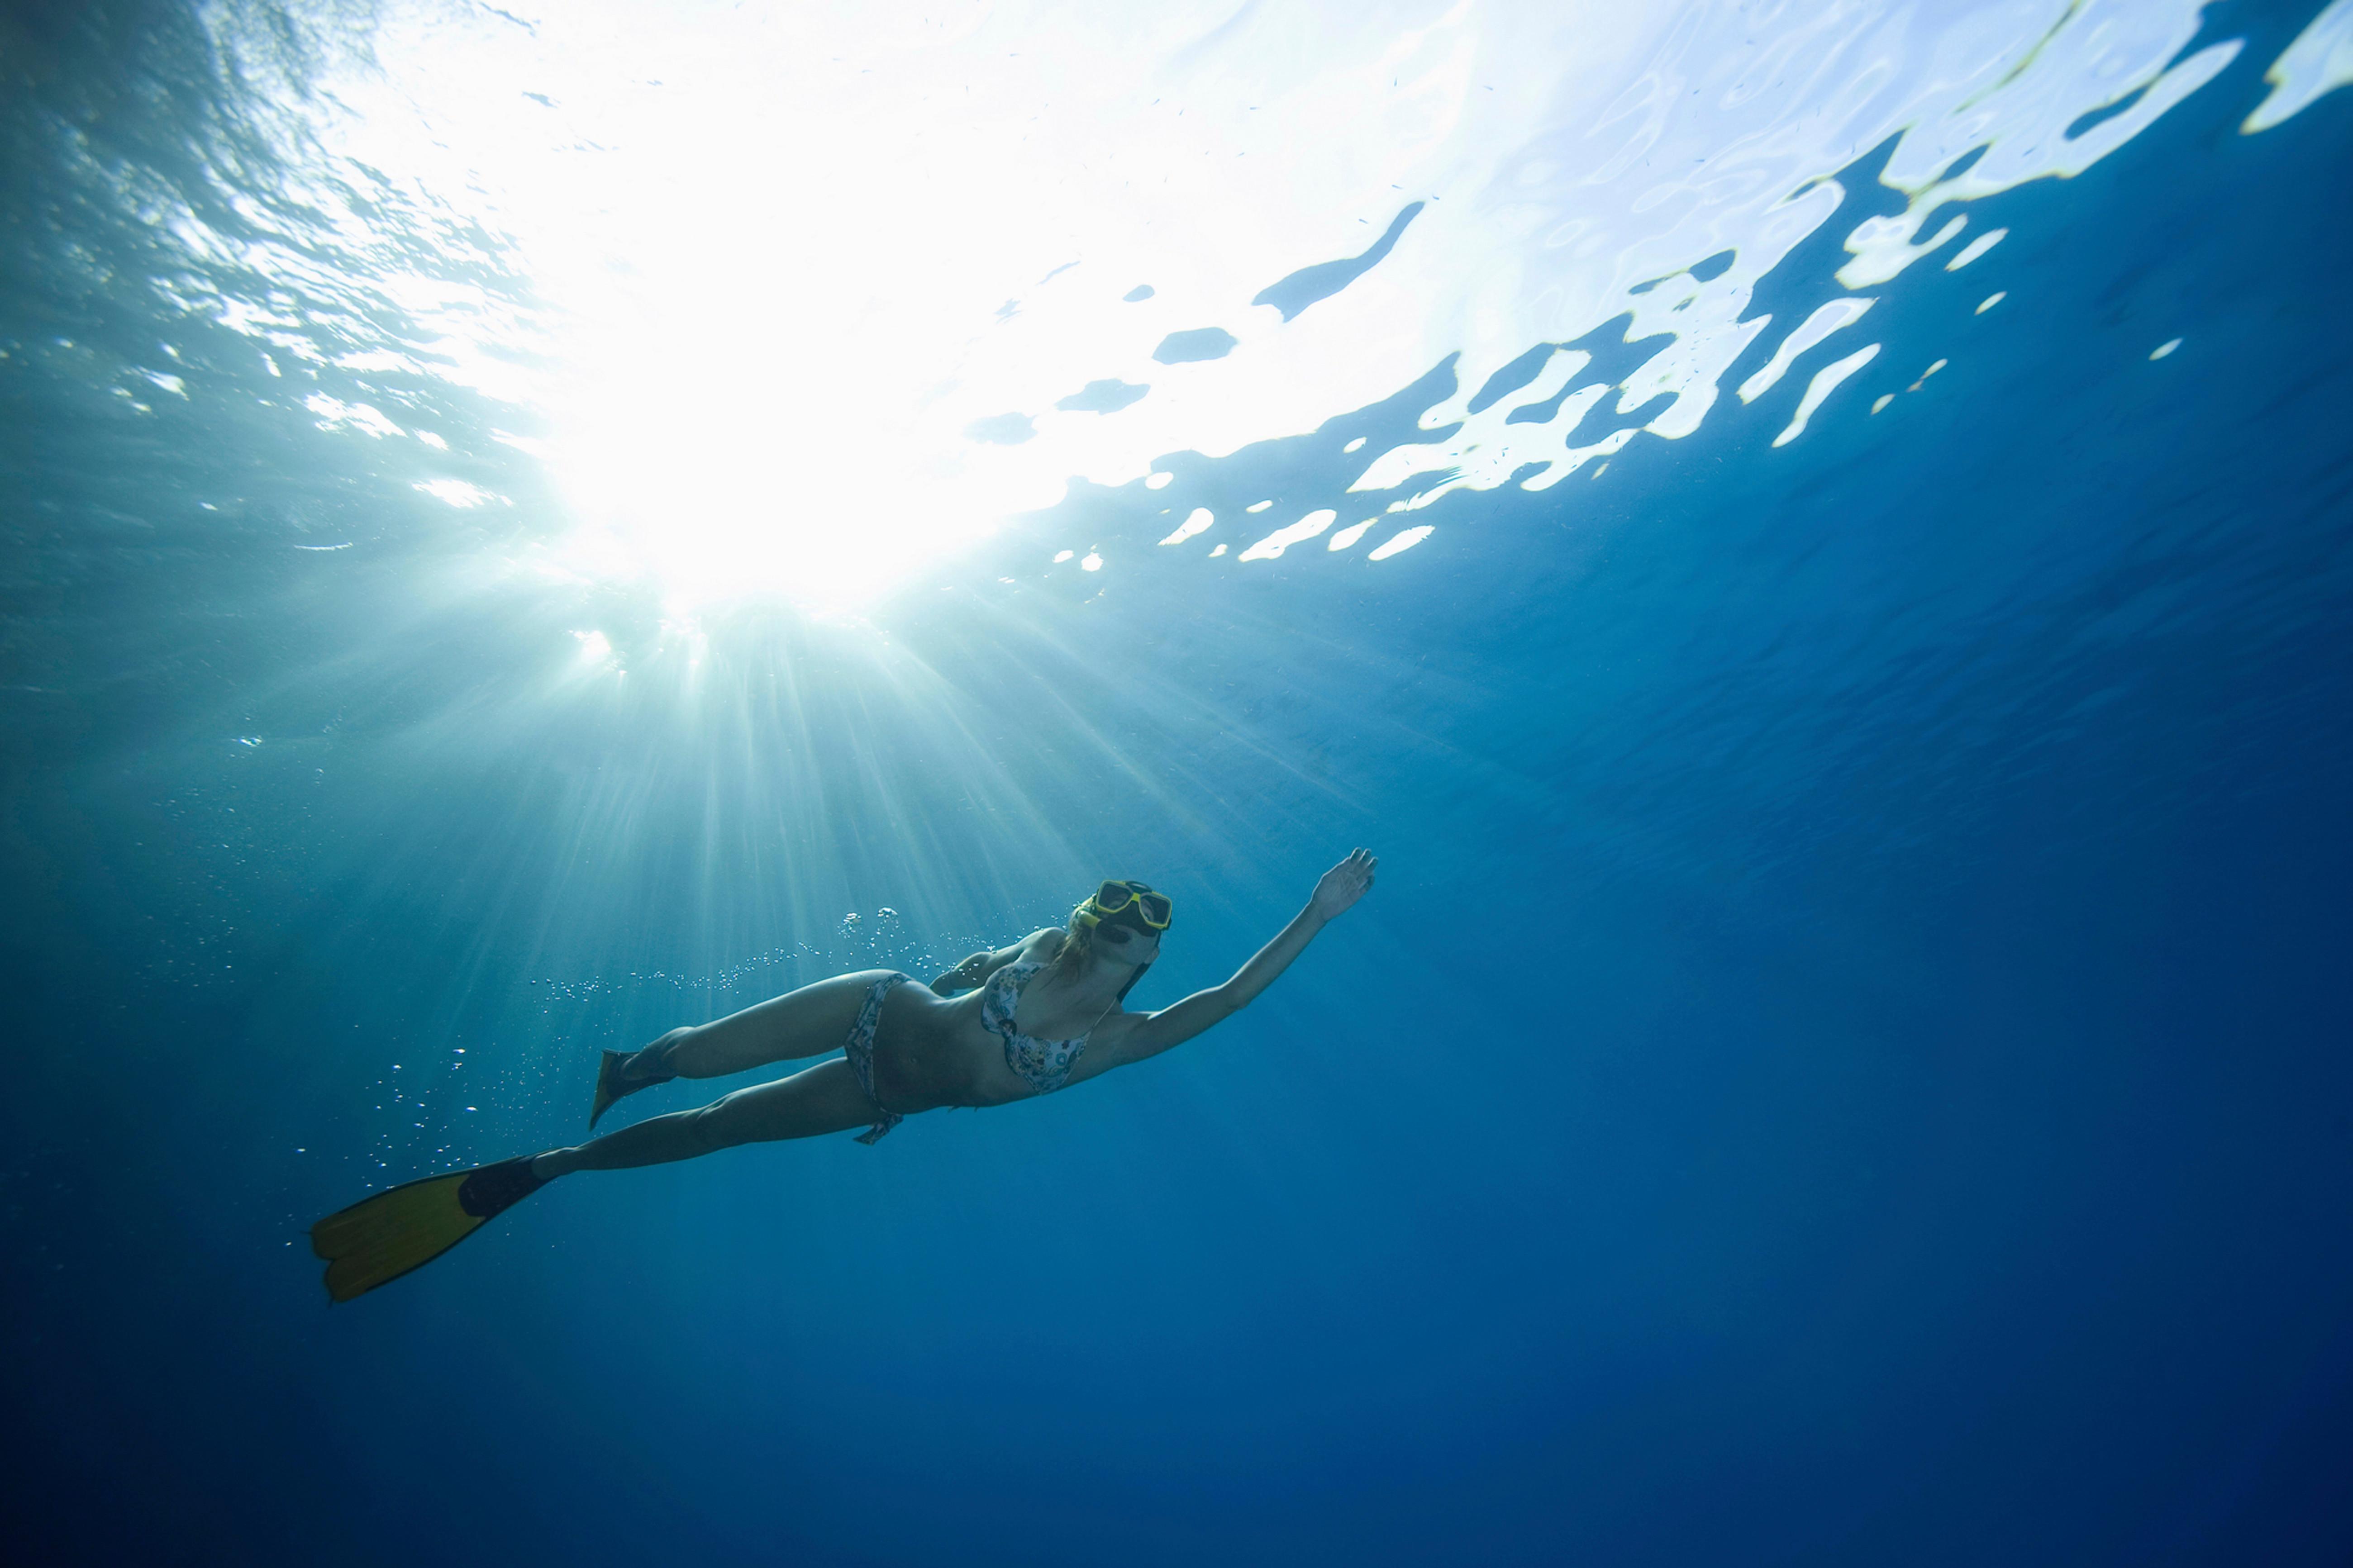 'Deep dive' Consultation